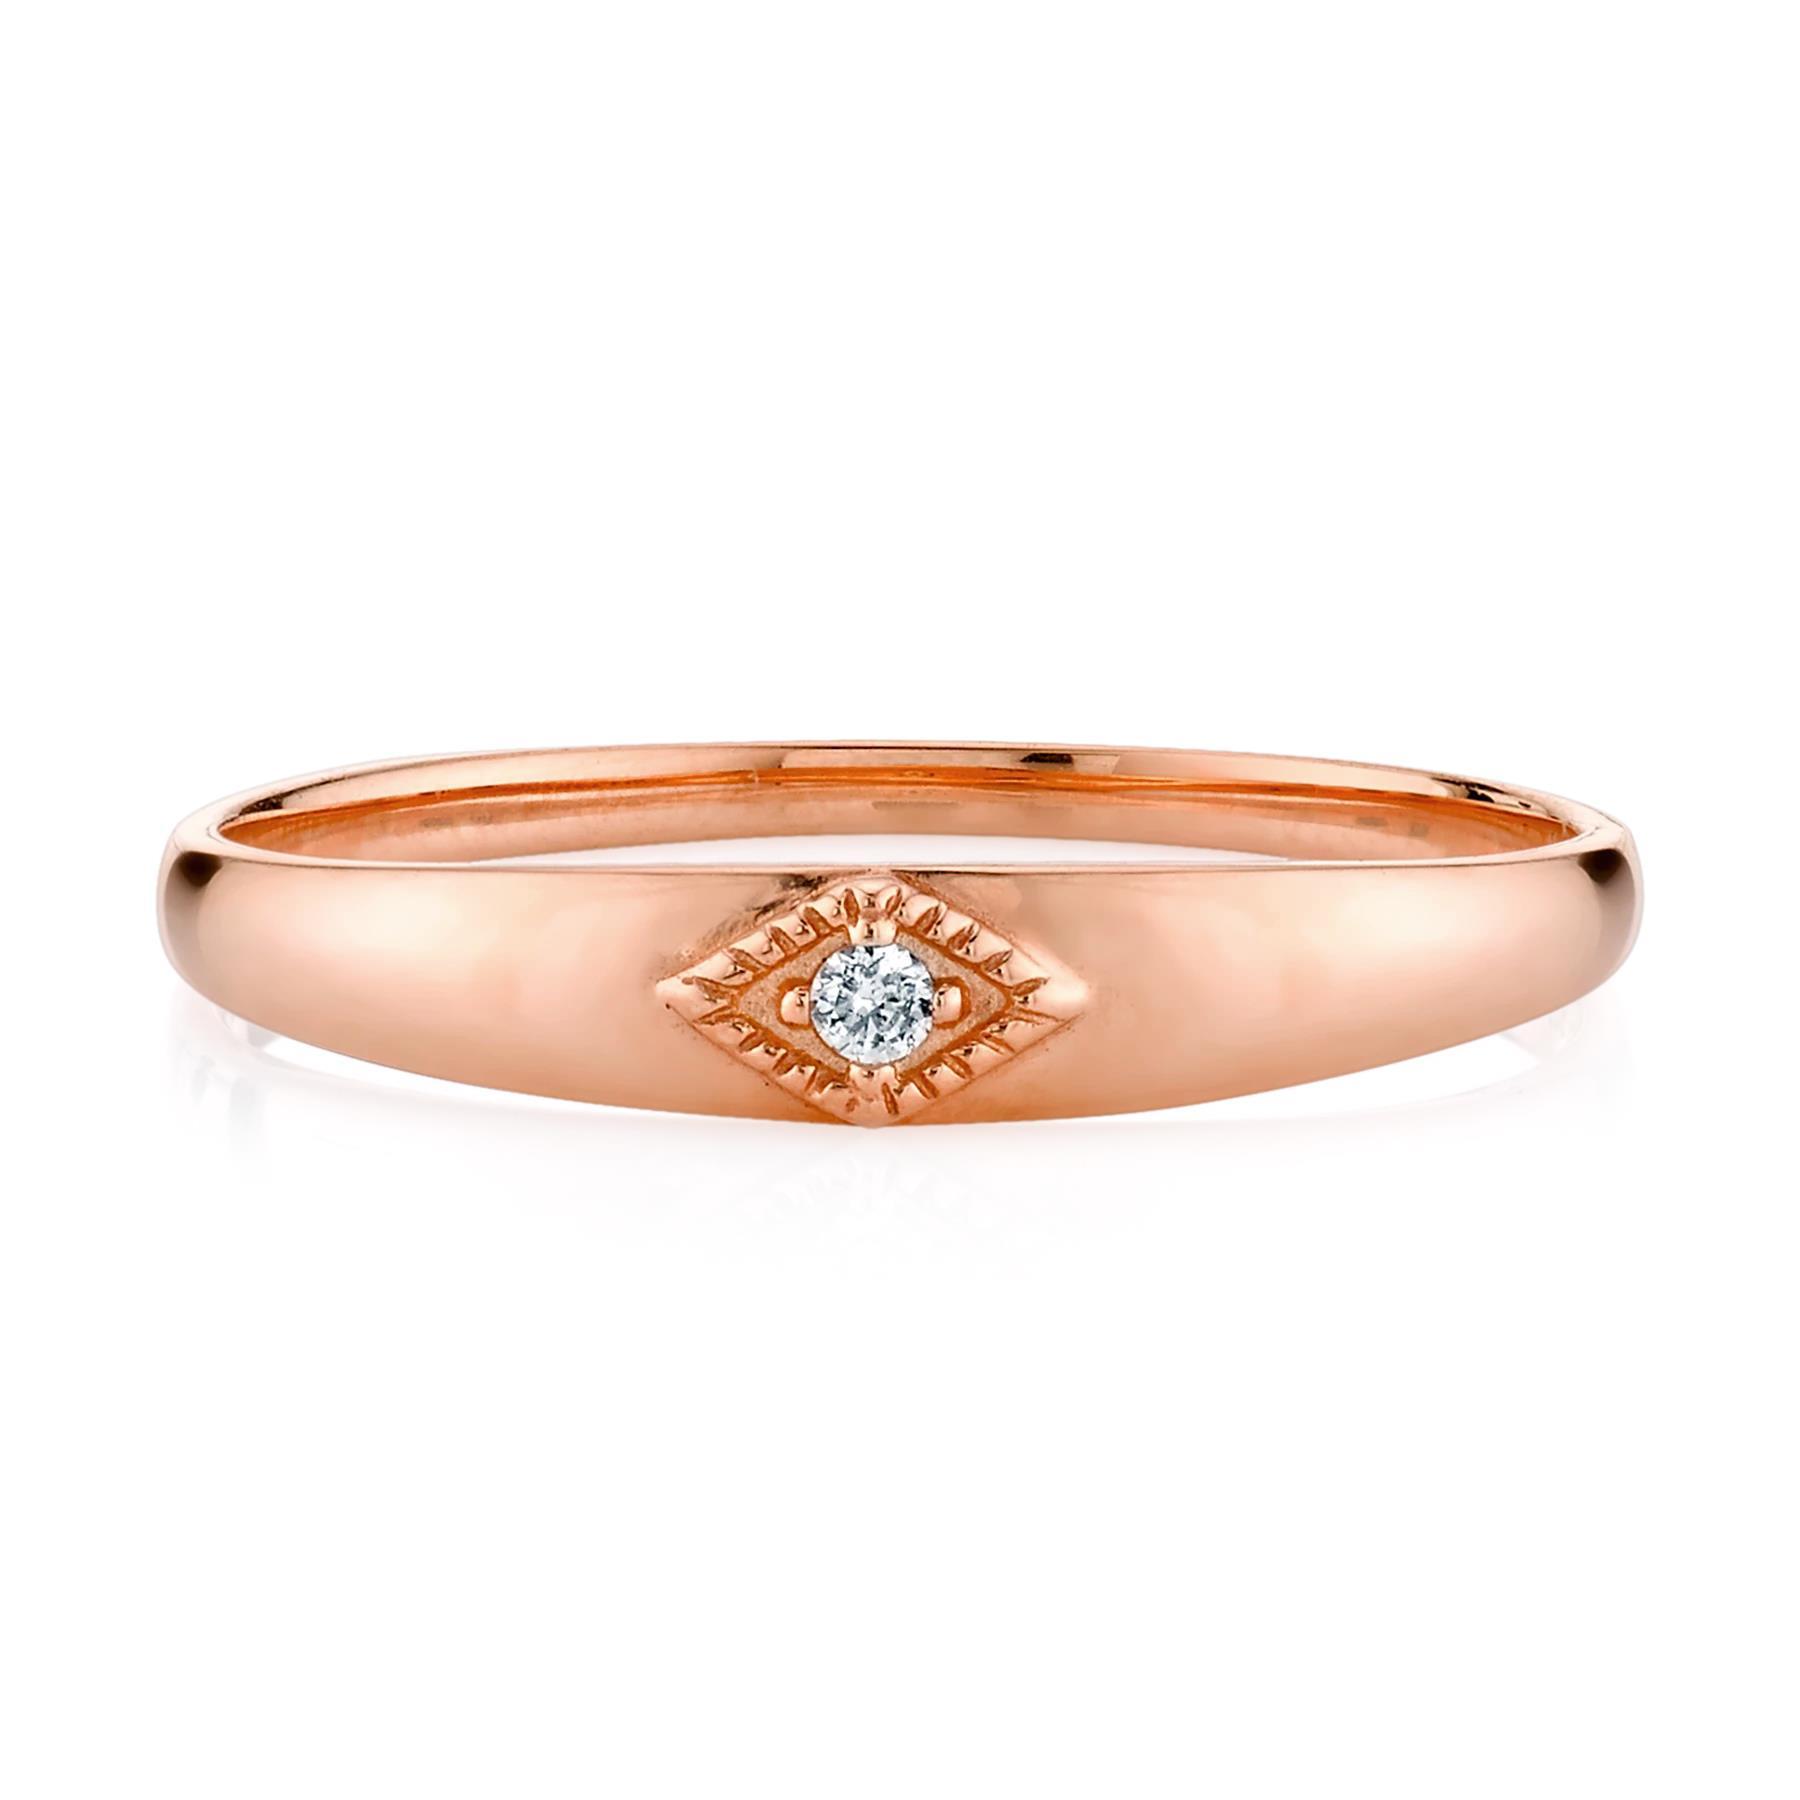 DIAMOND BABY RING